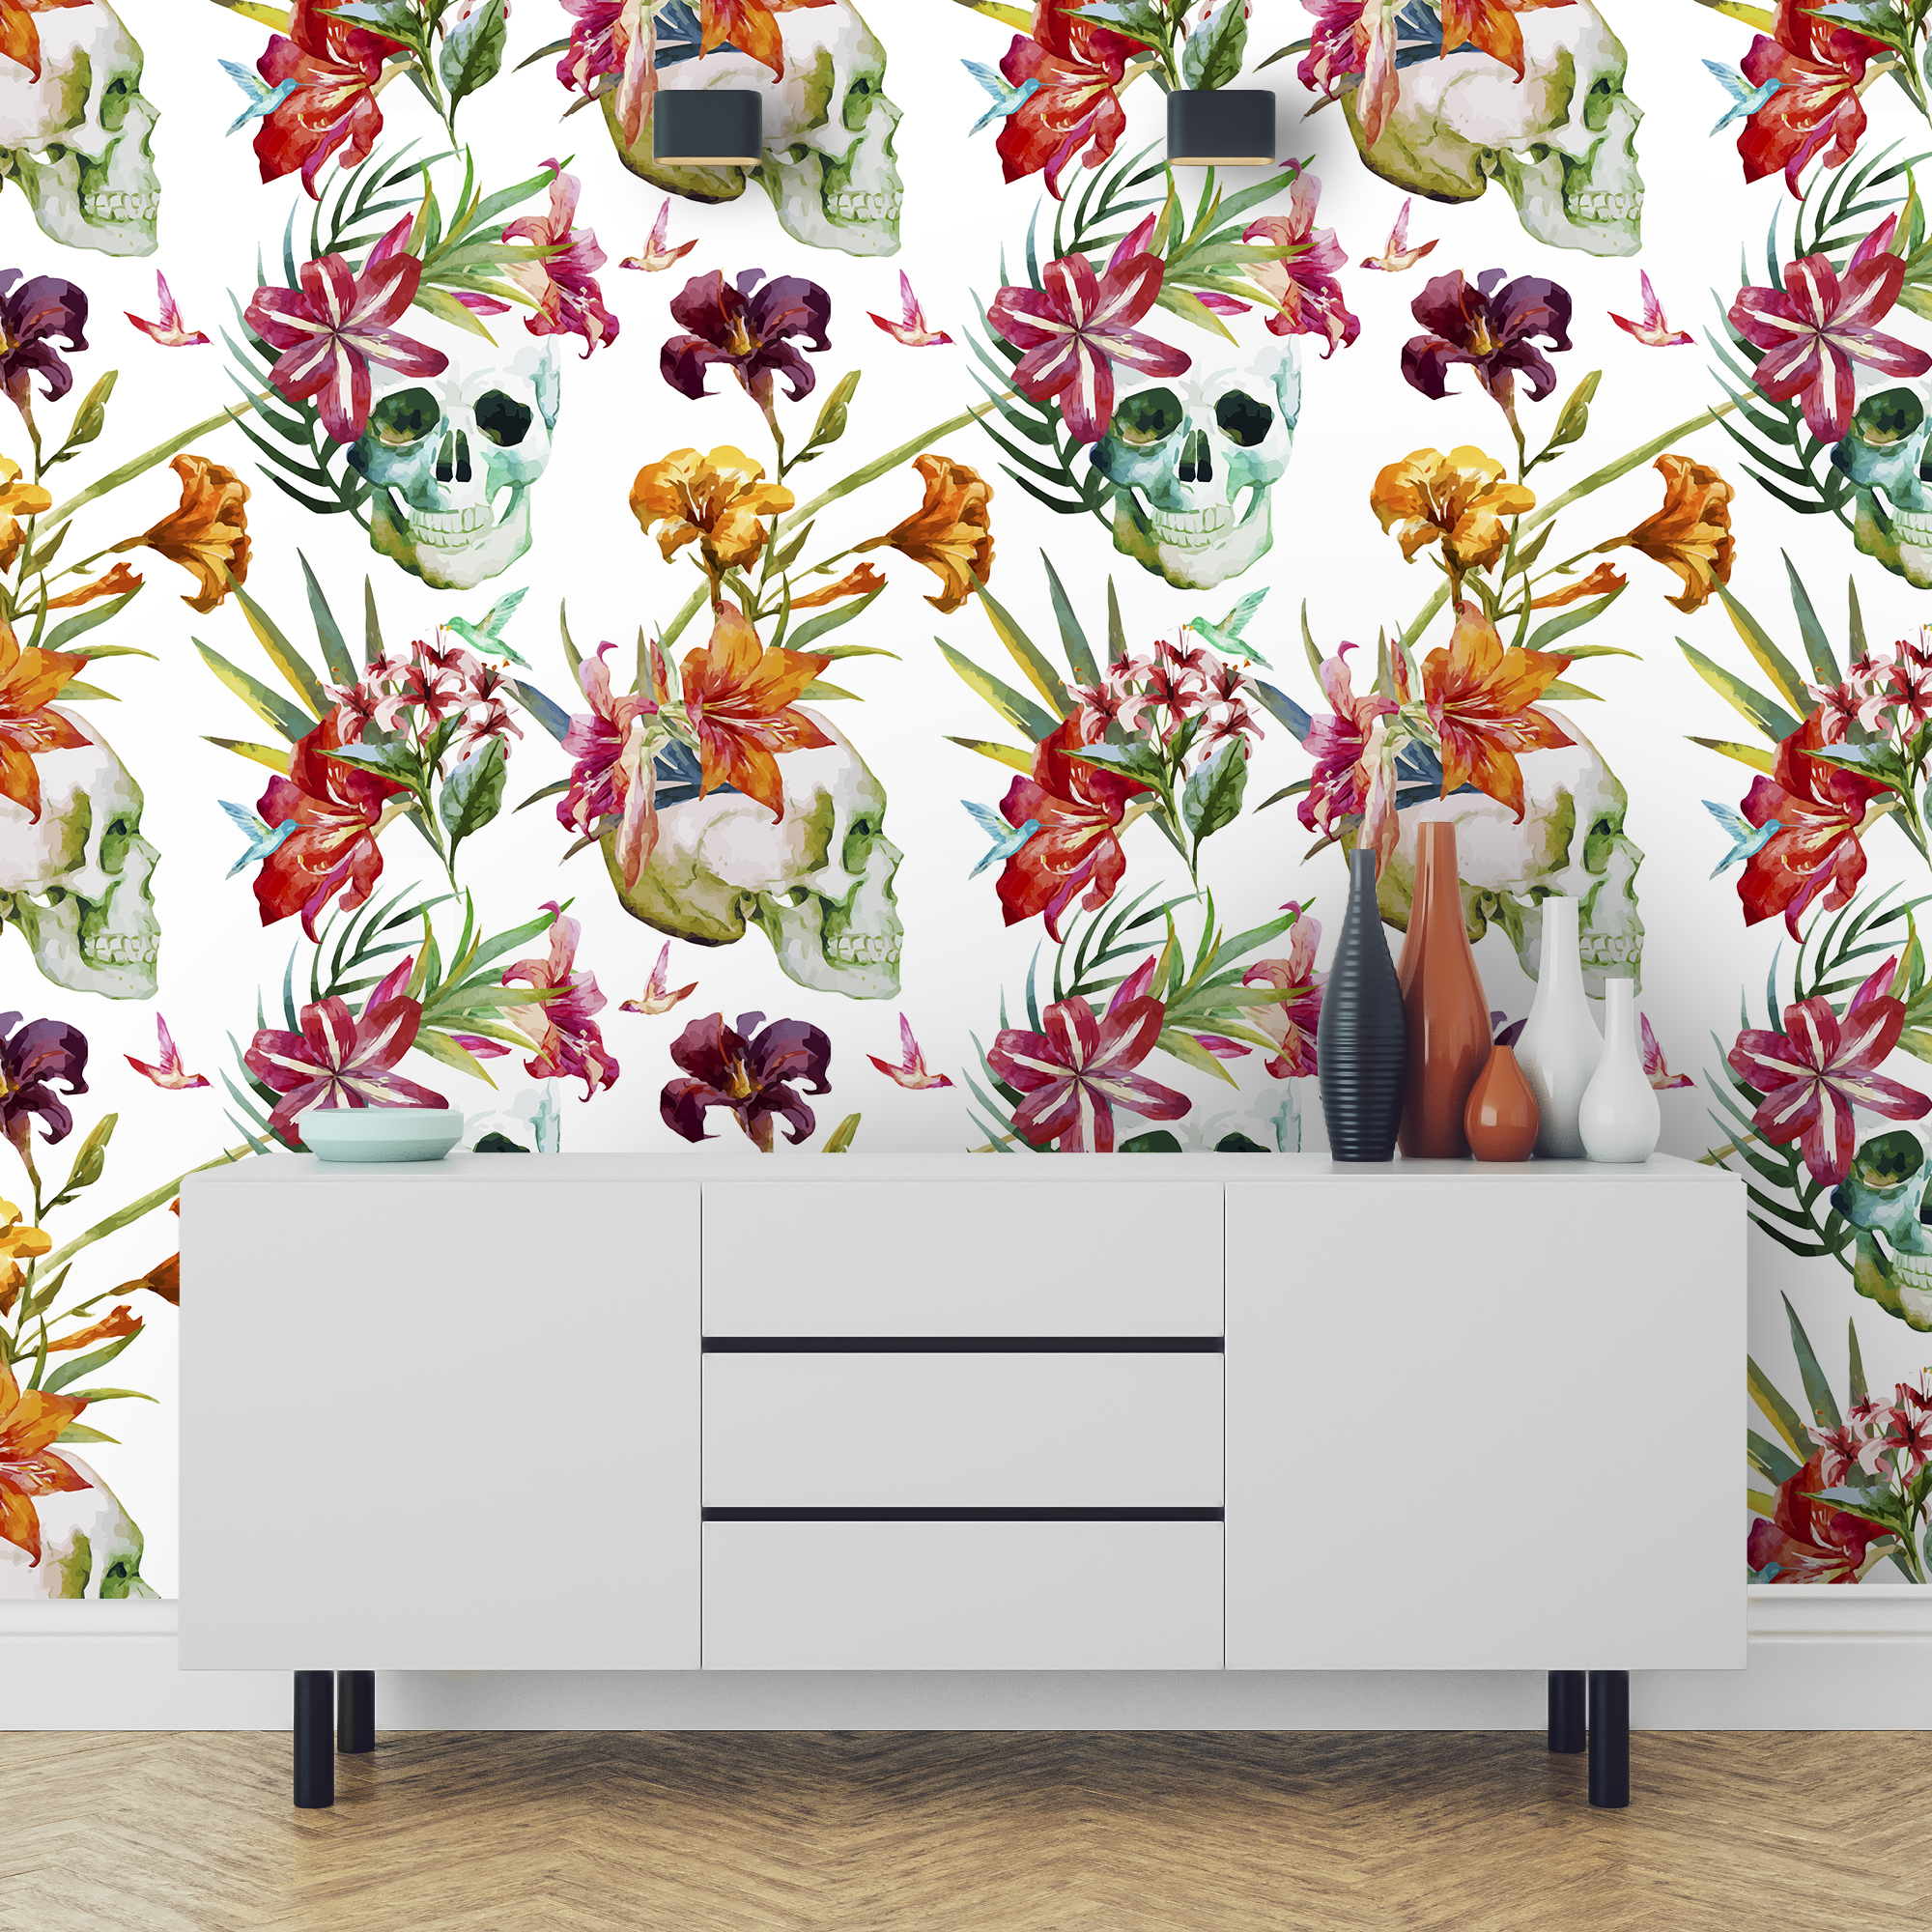 Watercolor Floral Skulls Wallpaper Moonwallstickers Com